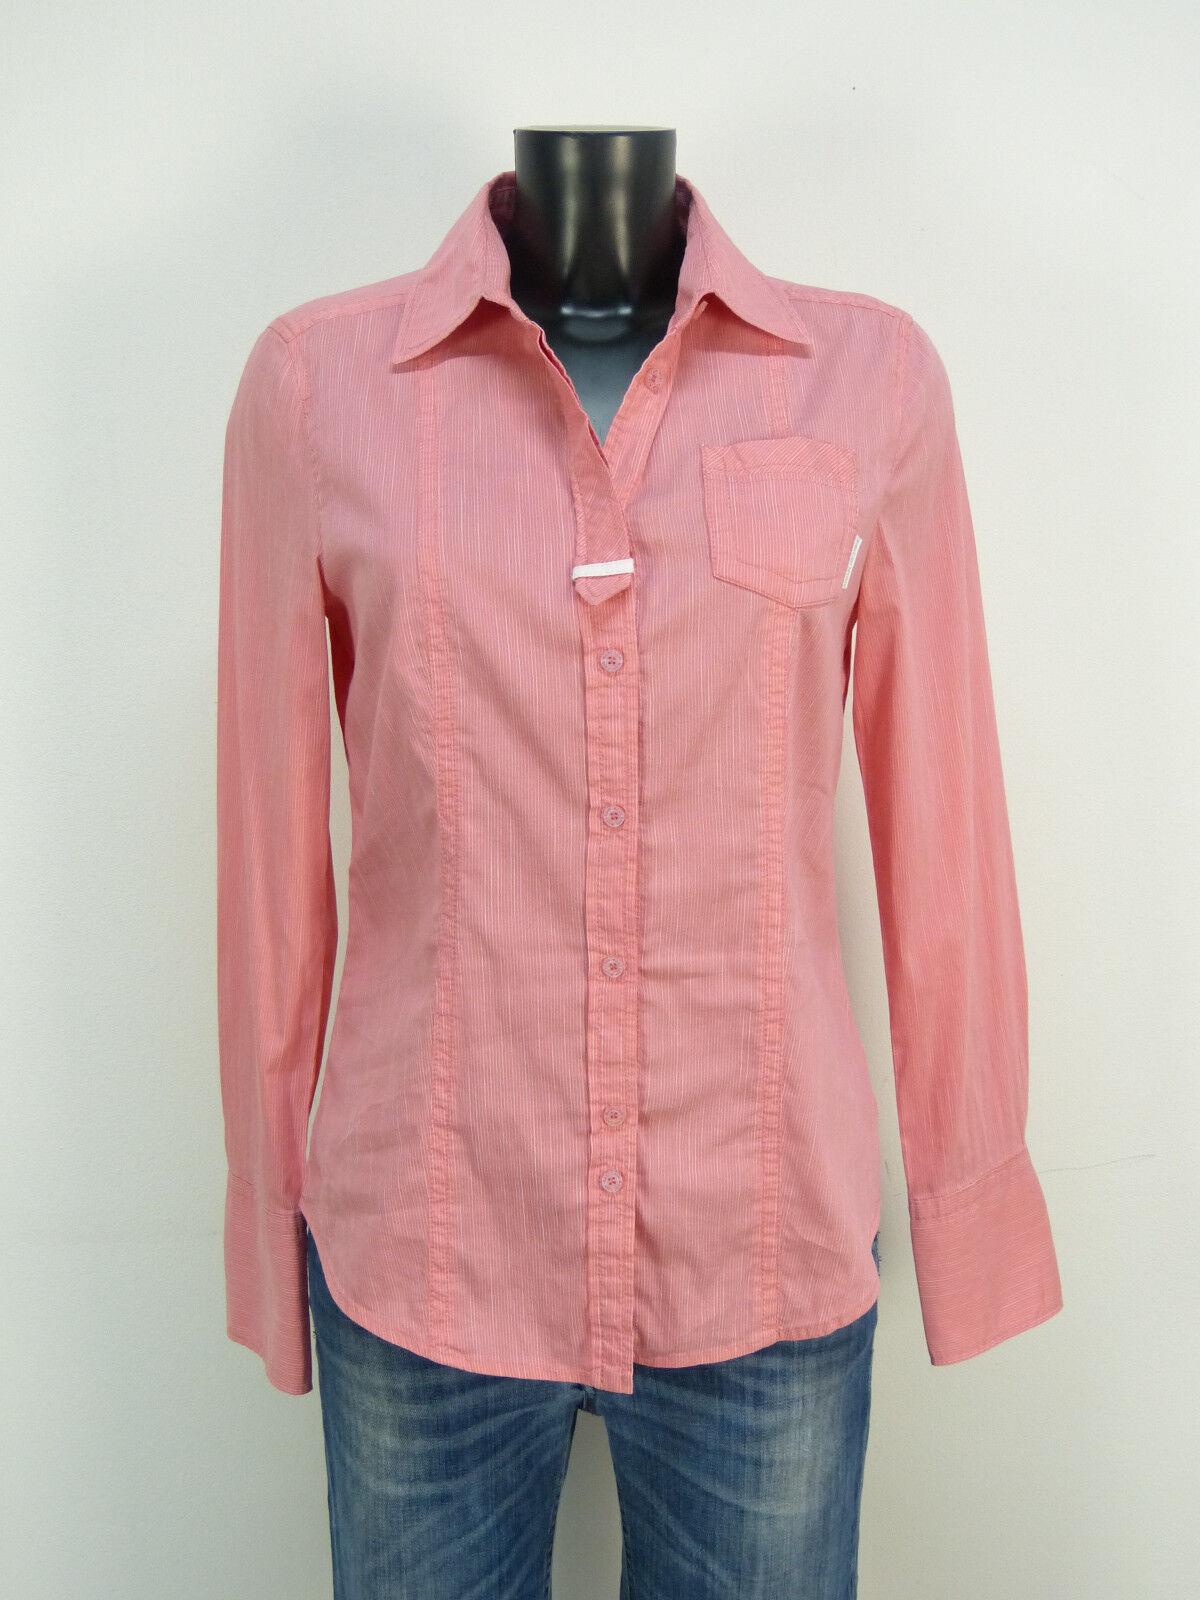 MARC CAIN blueSE GR 36 - N2   pink TON & NEUWERTIG - MIT STRETCH    ( L 9299 )